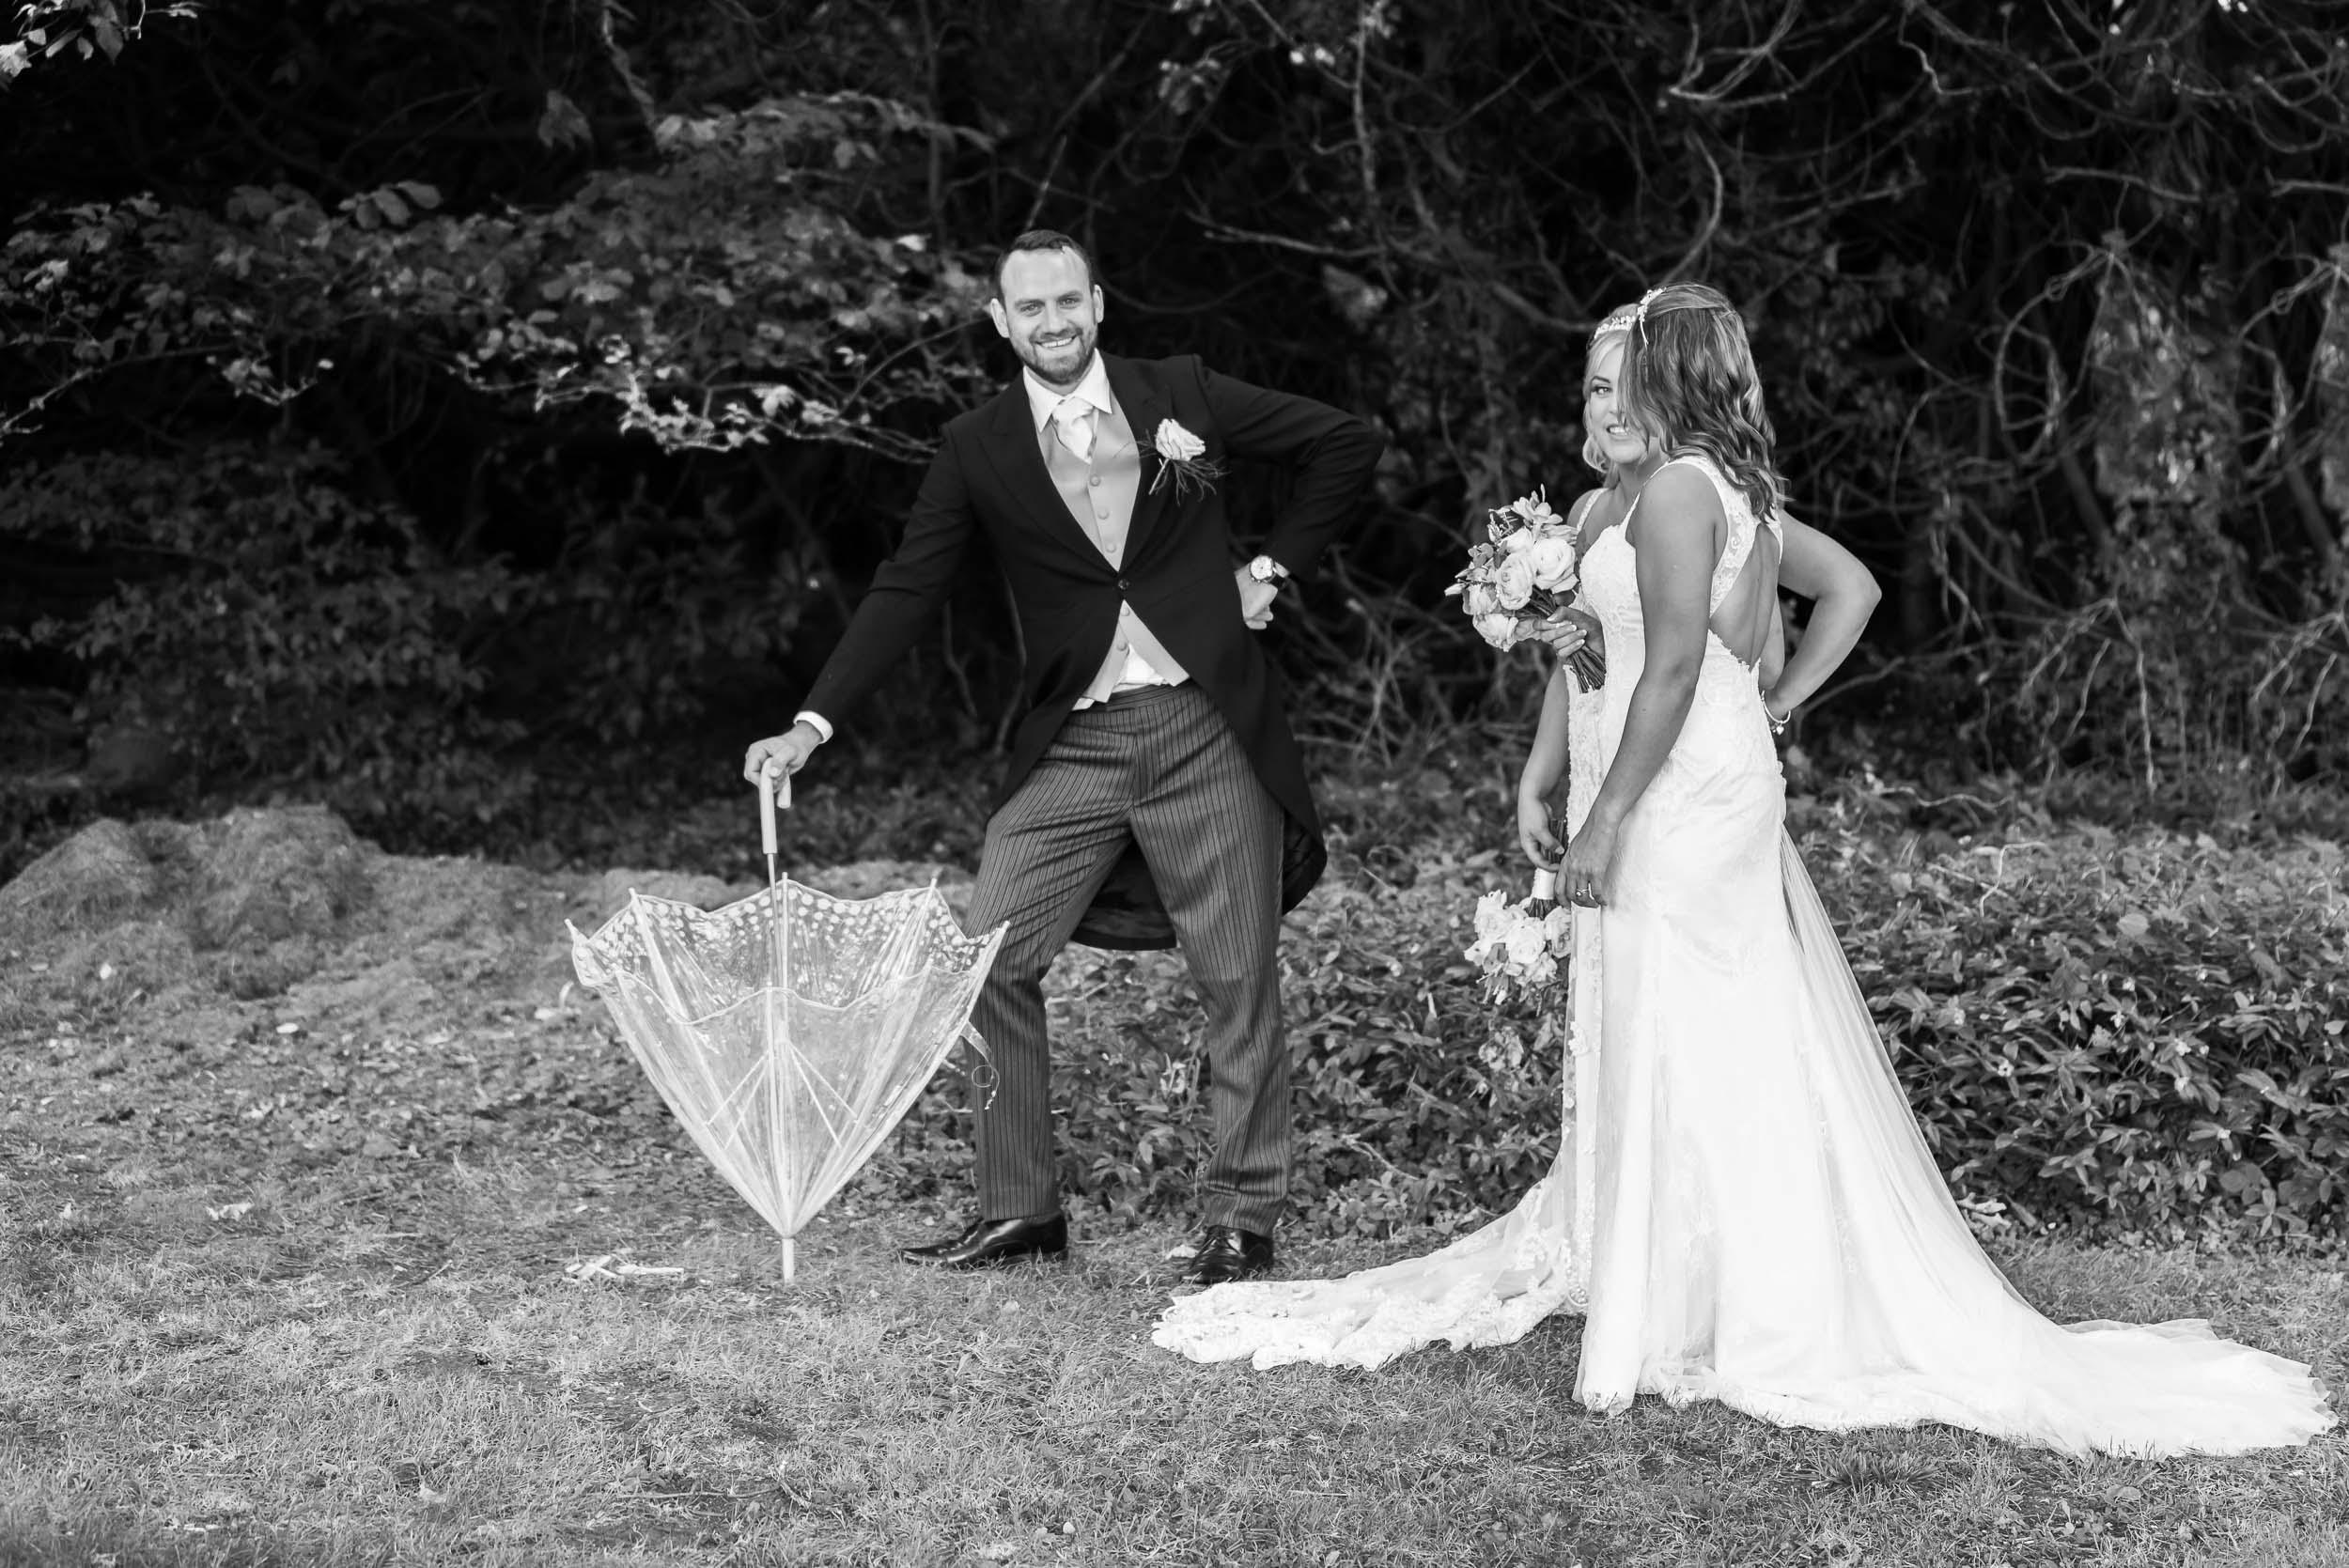 NC-20170909-2017-09-09_livvy-and-alice-wedding-1184.jpg